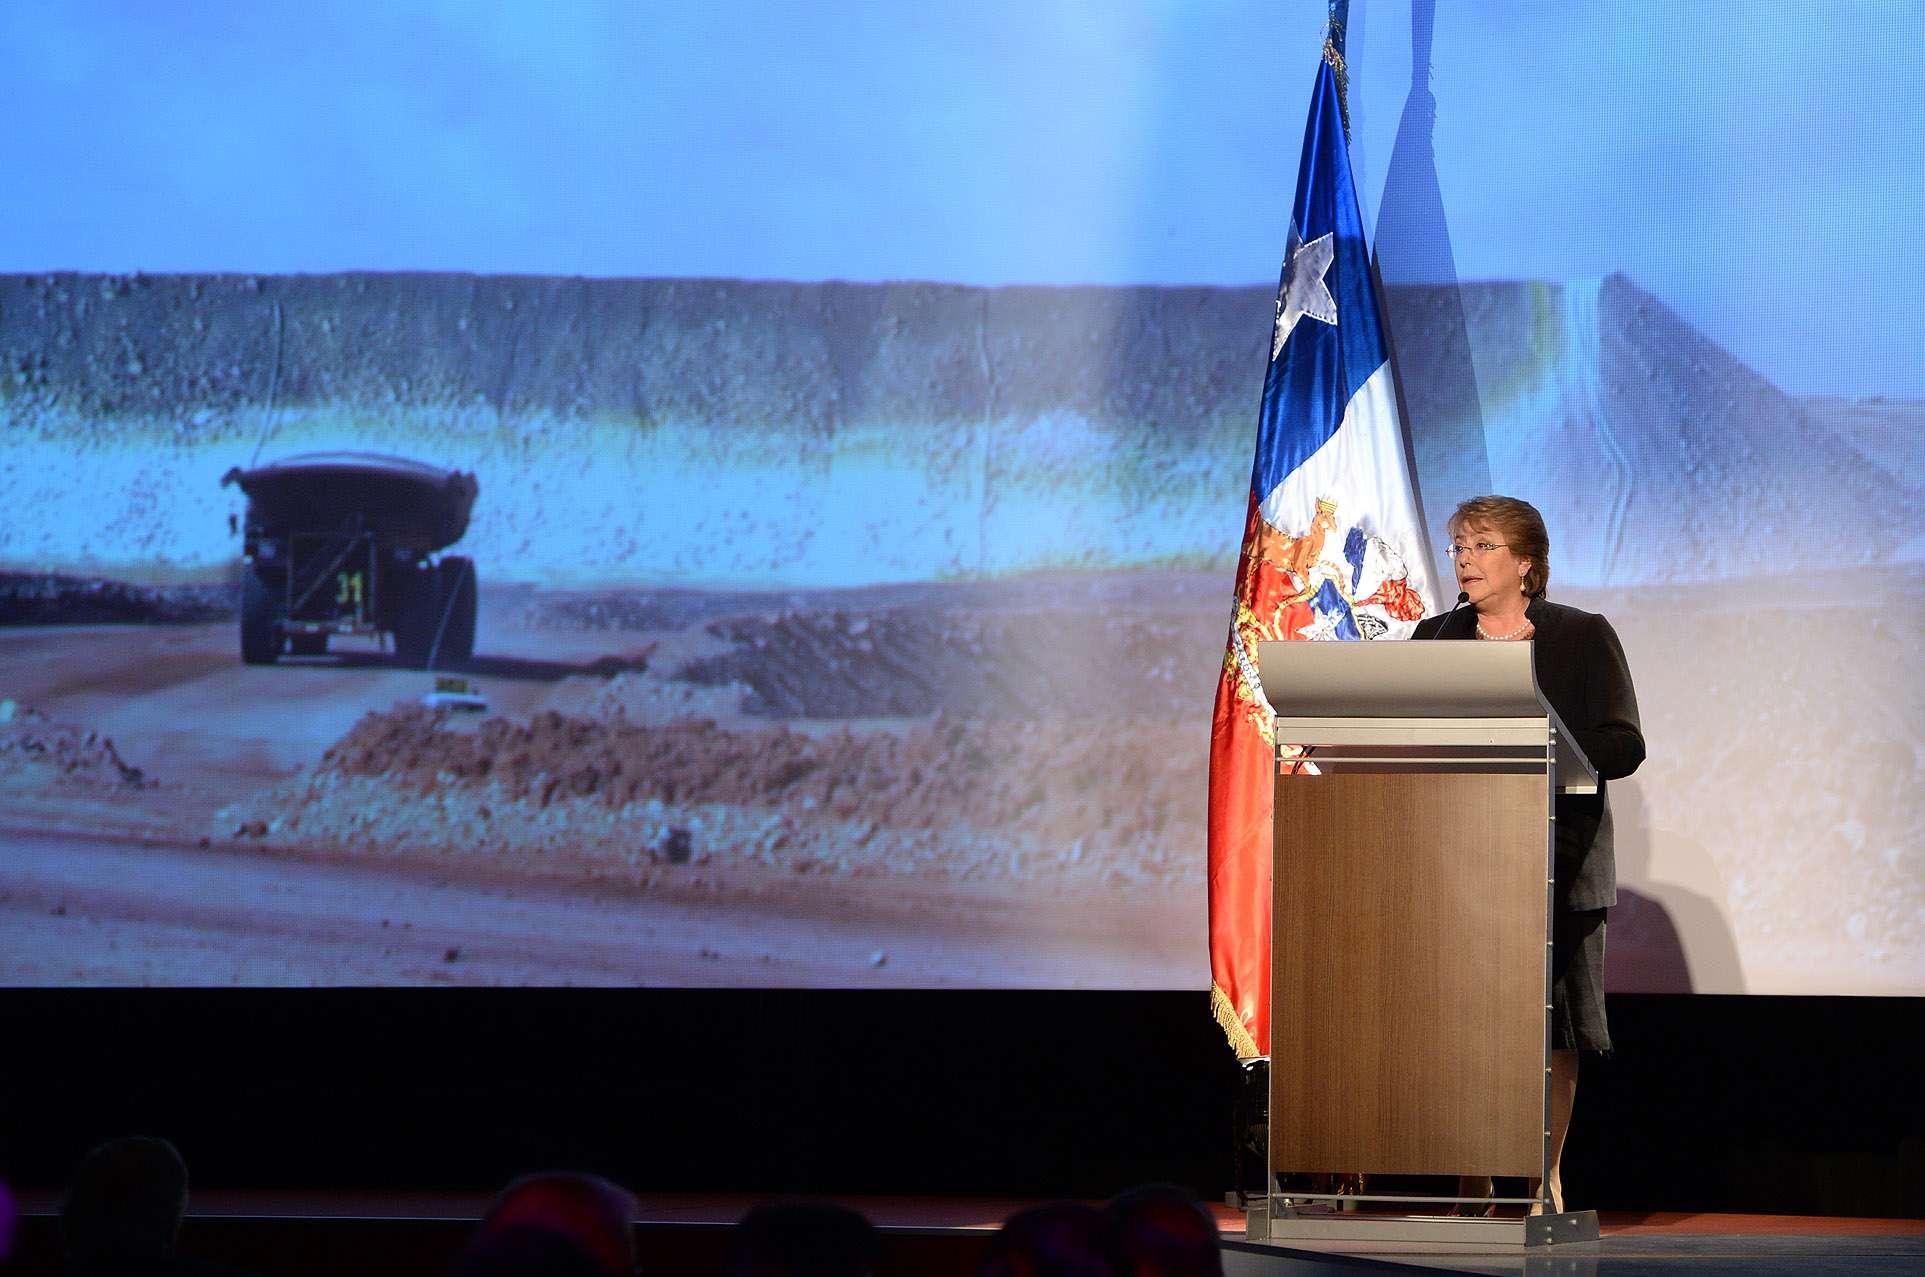 Presidencia / Alex Ibáñez